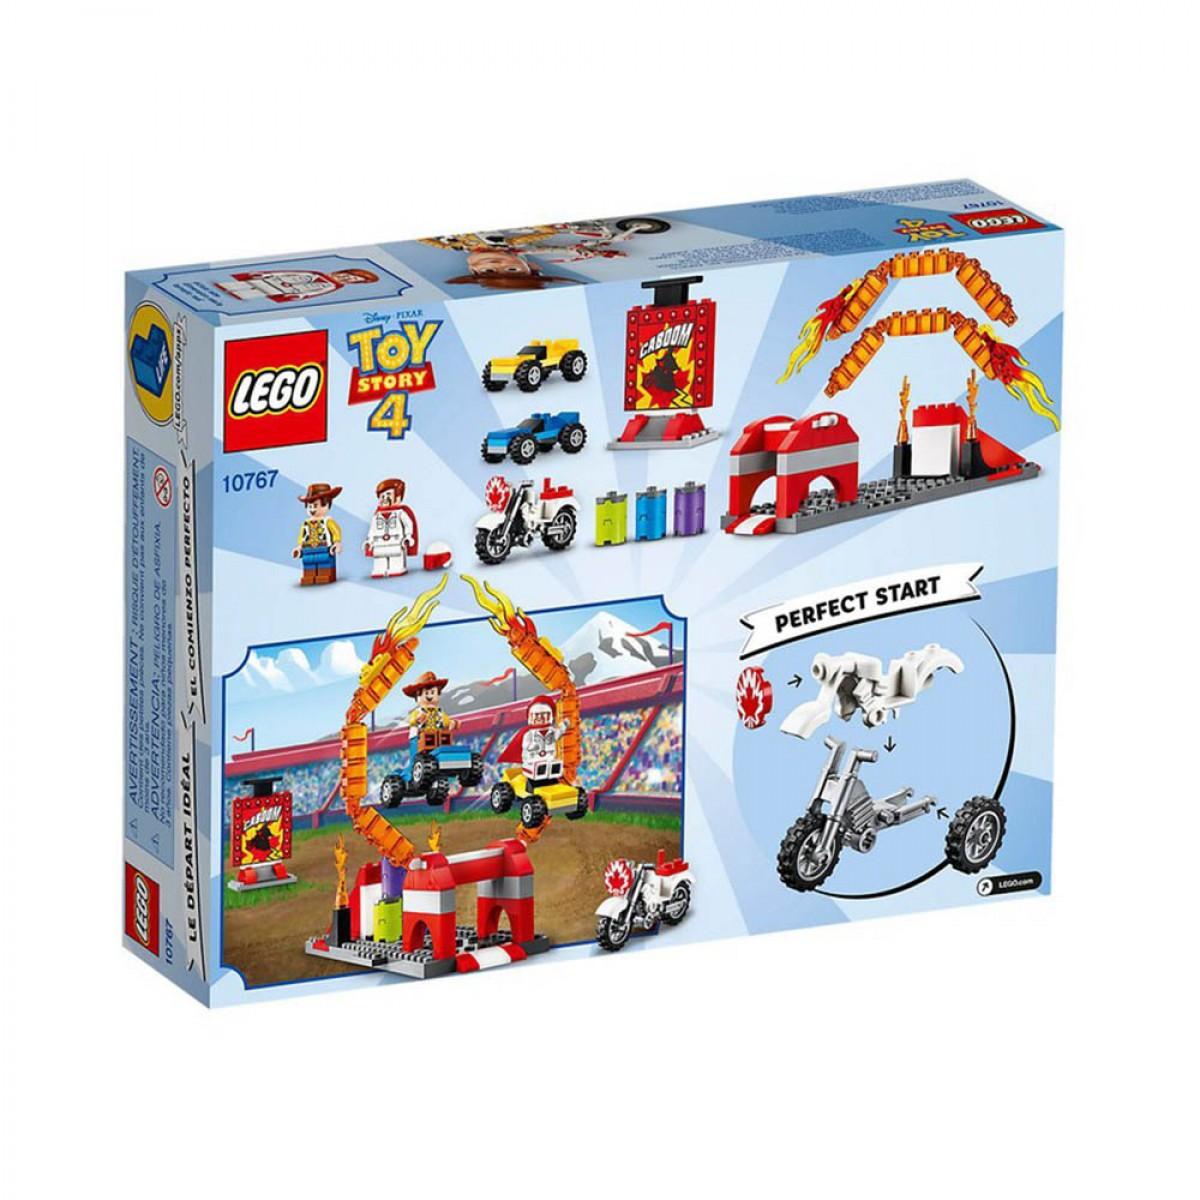 LEGO CONF NEW IP 2019- 2  10767